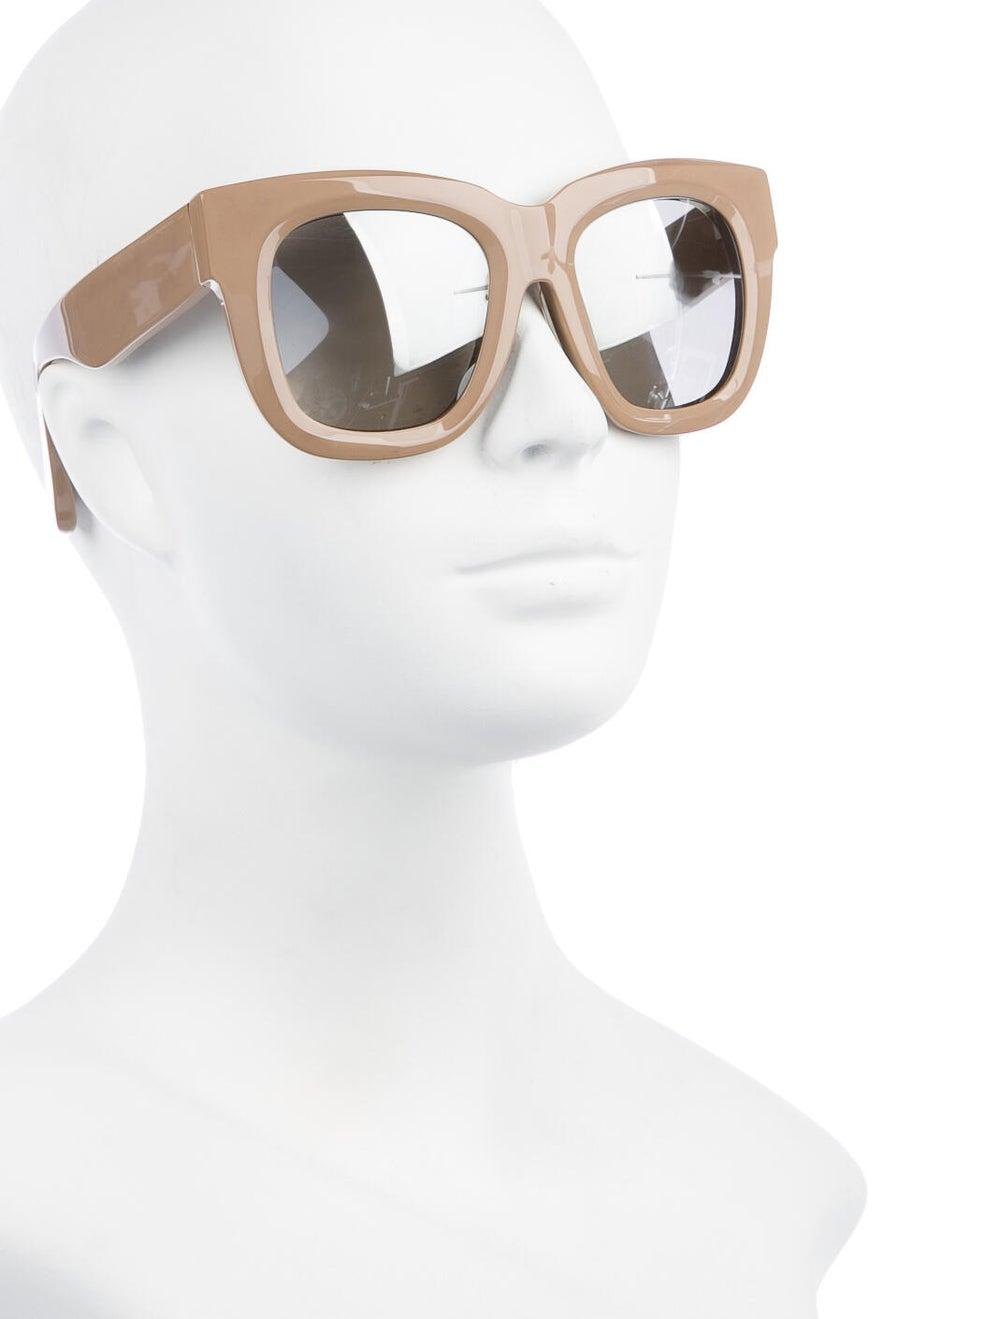 Acne Studios Square Mirrored Sunglasses - image 4